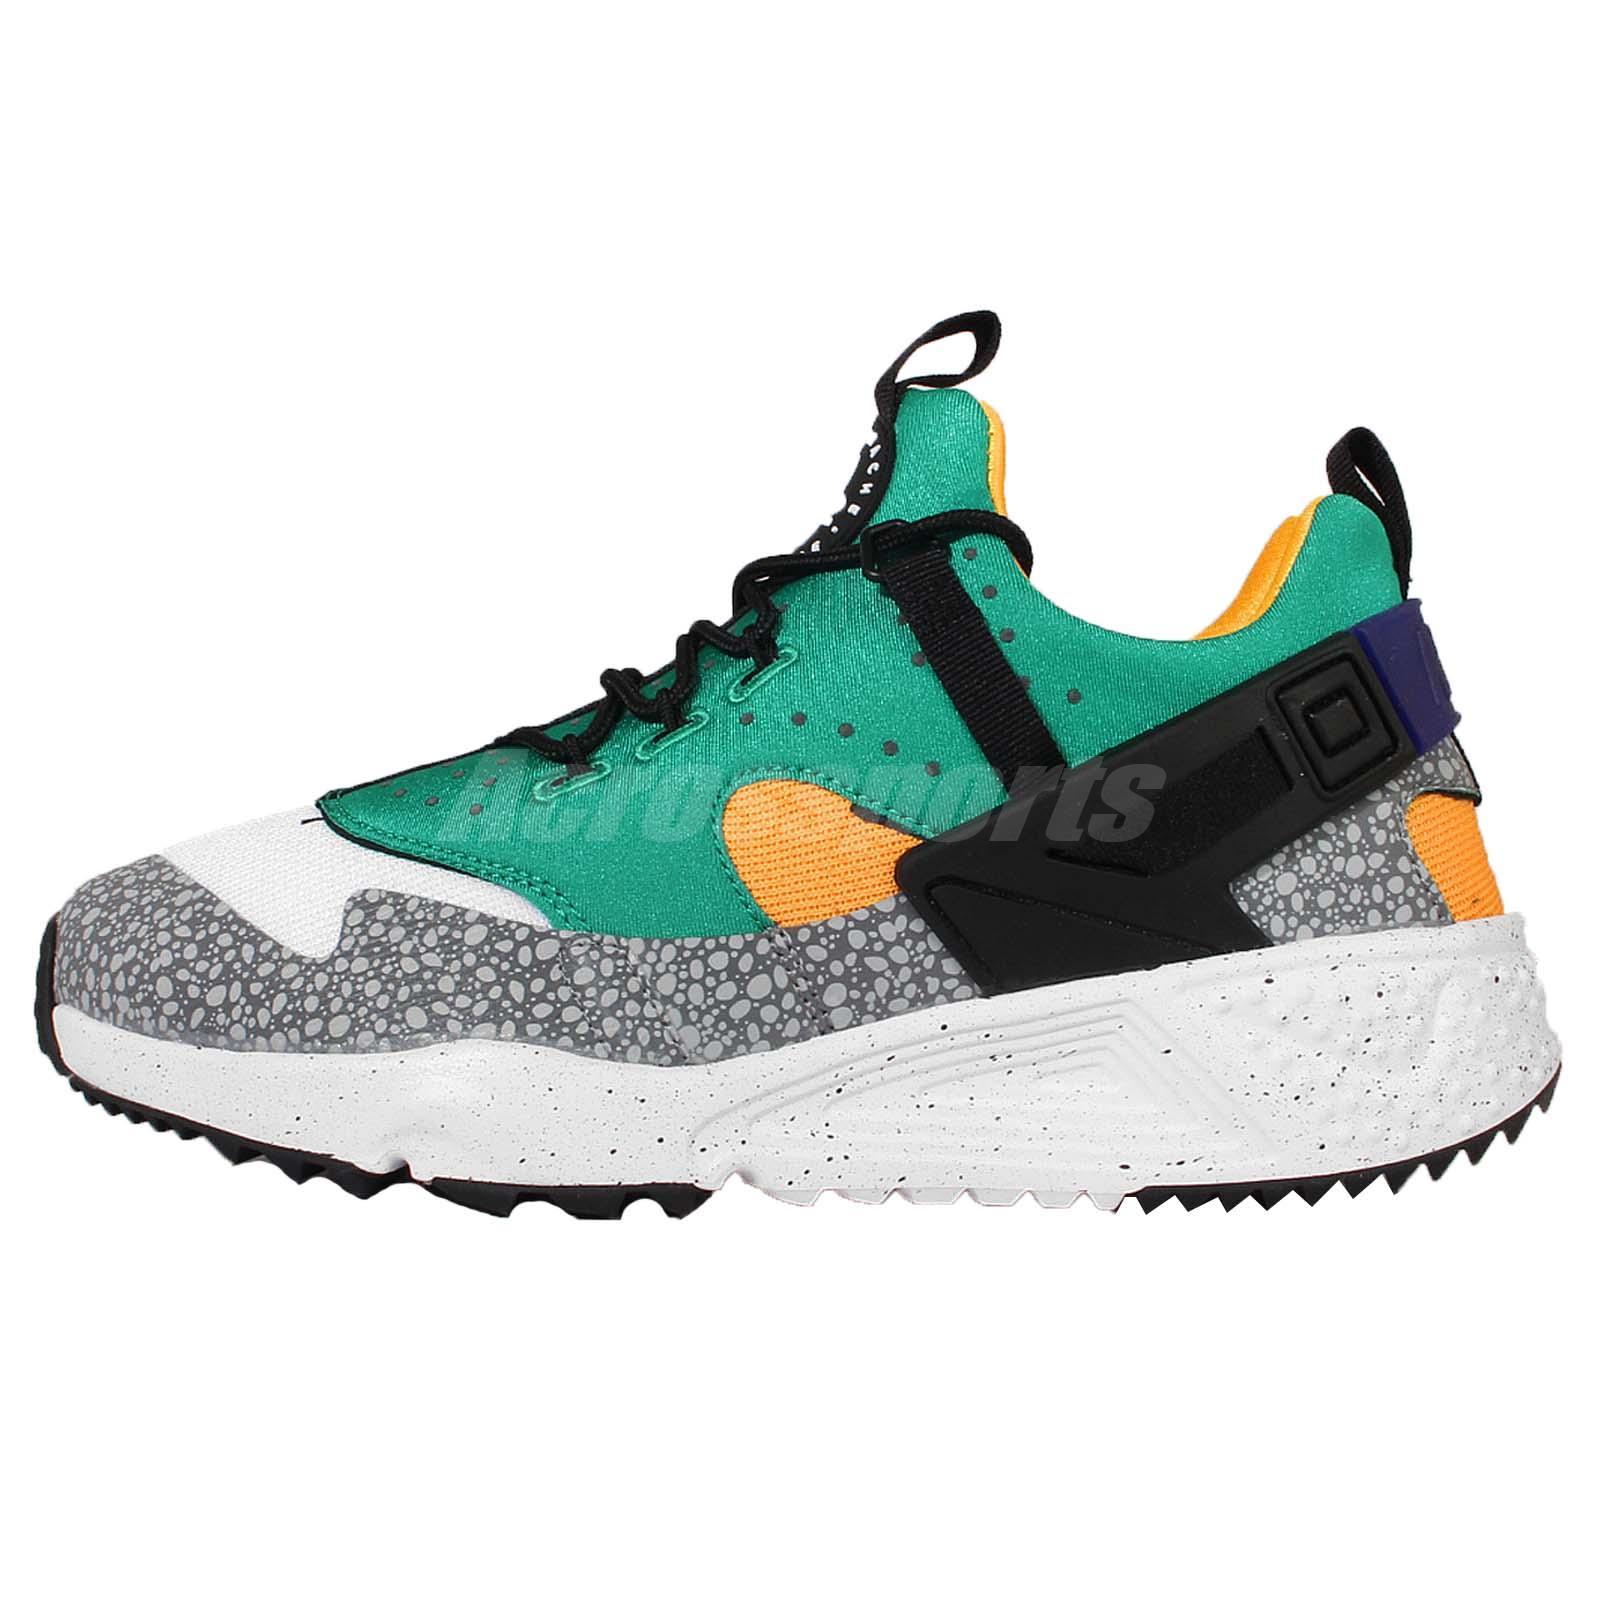 Nike Air Huarache Utility PRM Grey Emerald Green Mens Running Shoes  806979-103